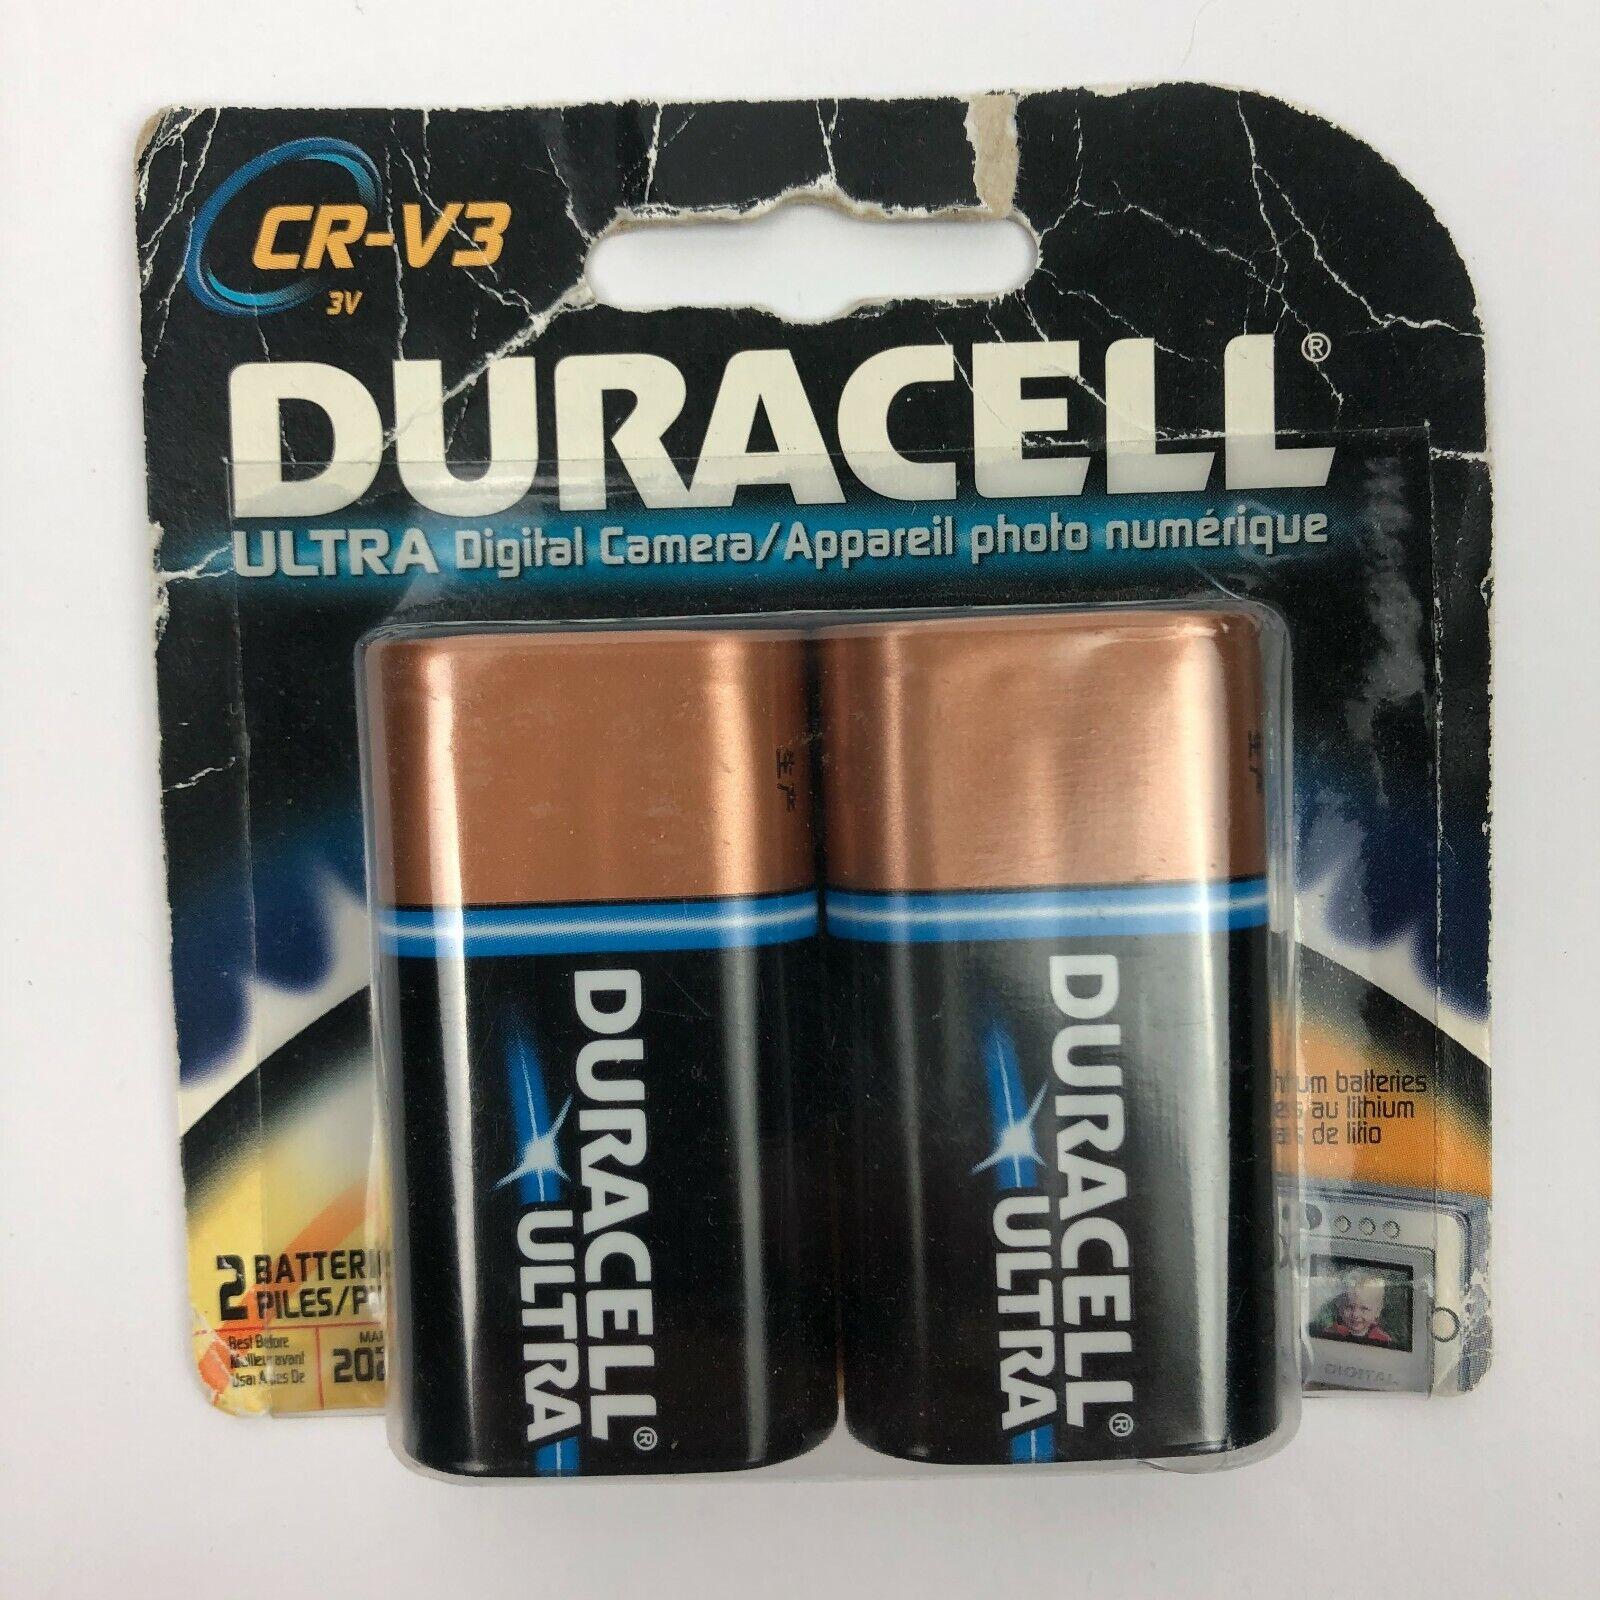 Duracell CR-V3 3V Lithium Camera Photo Battery 2 Pack Expire MAR 2021 NOS